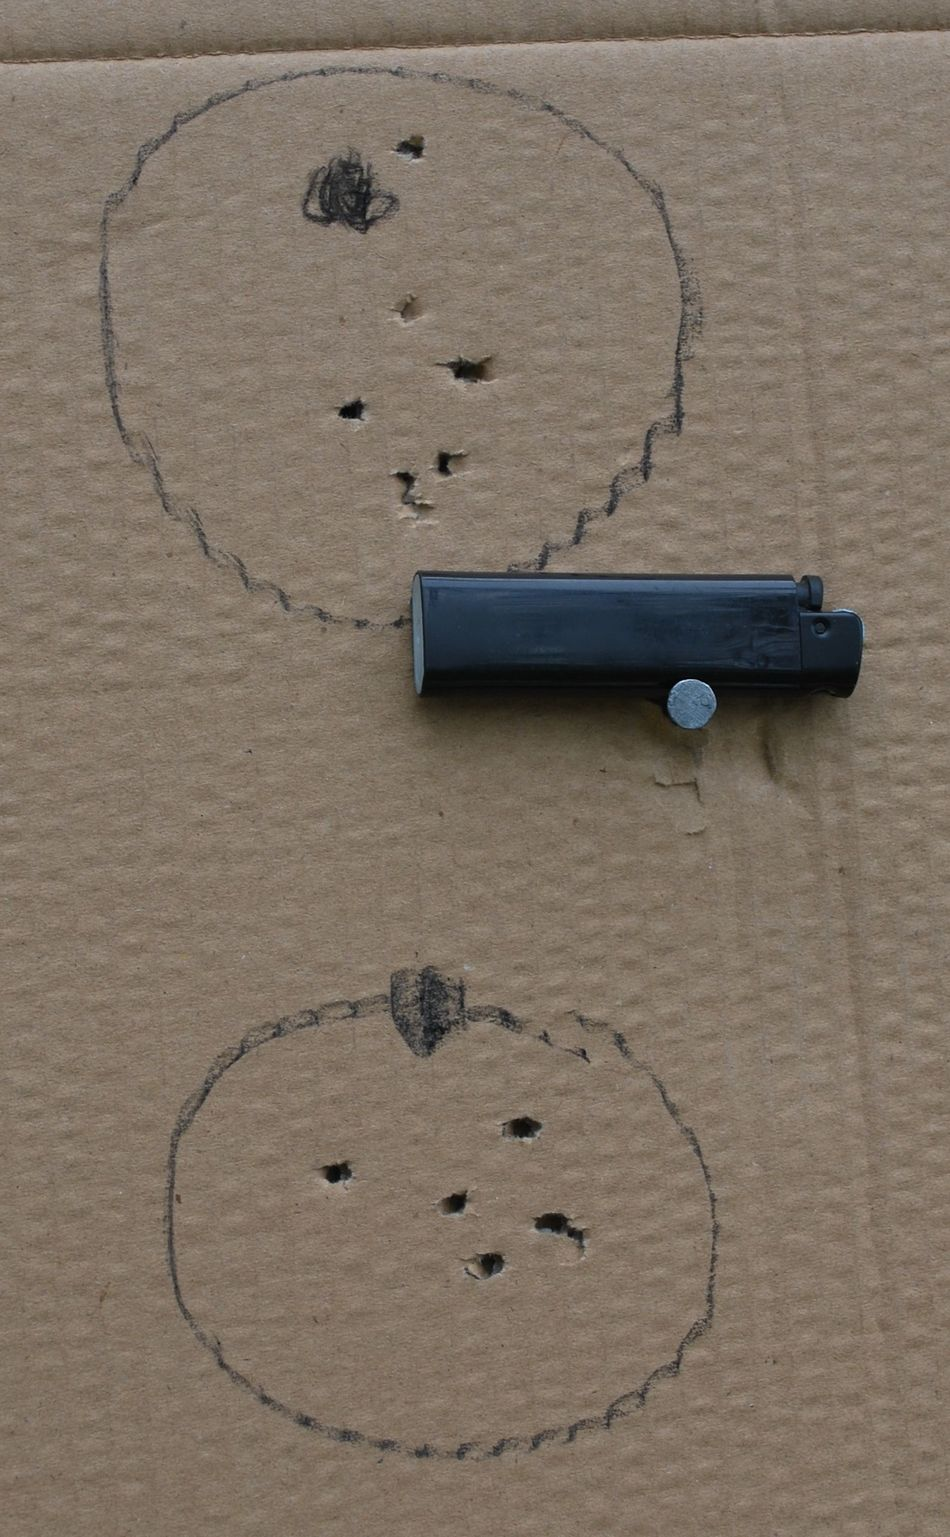 walther cp99 2 Мой взгляд на пневматический пистолет Umarex Walther CP99